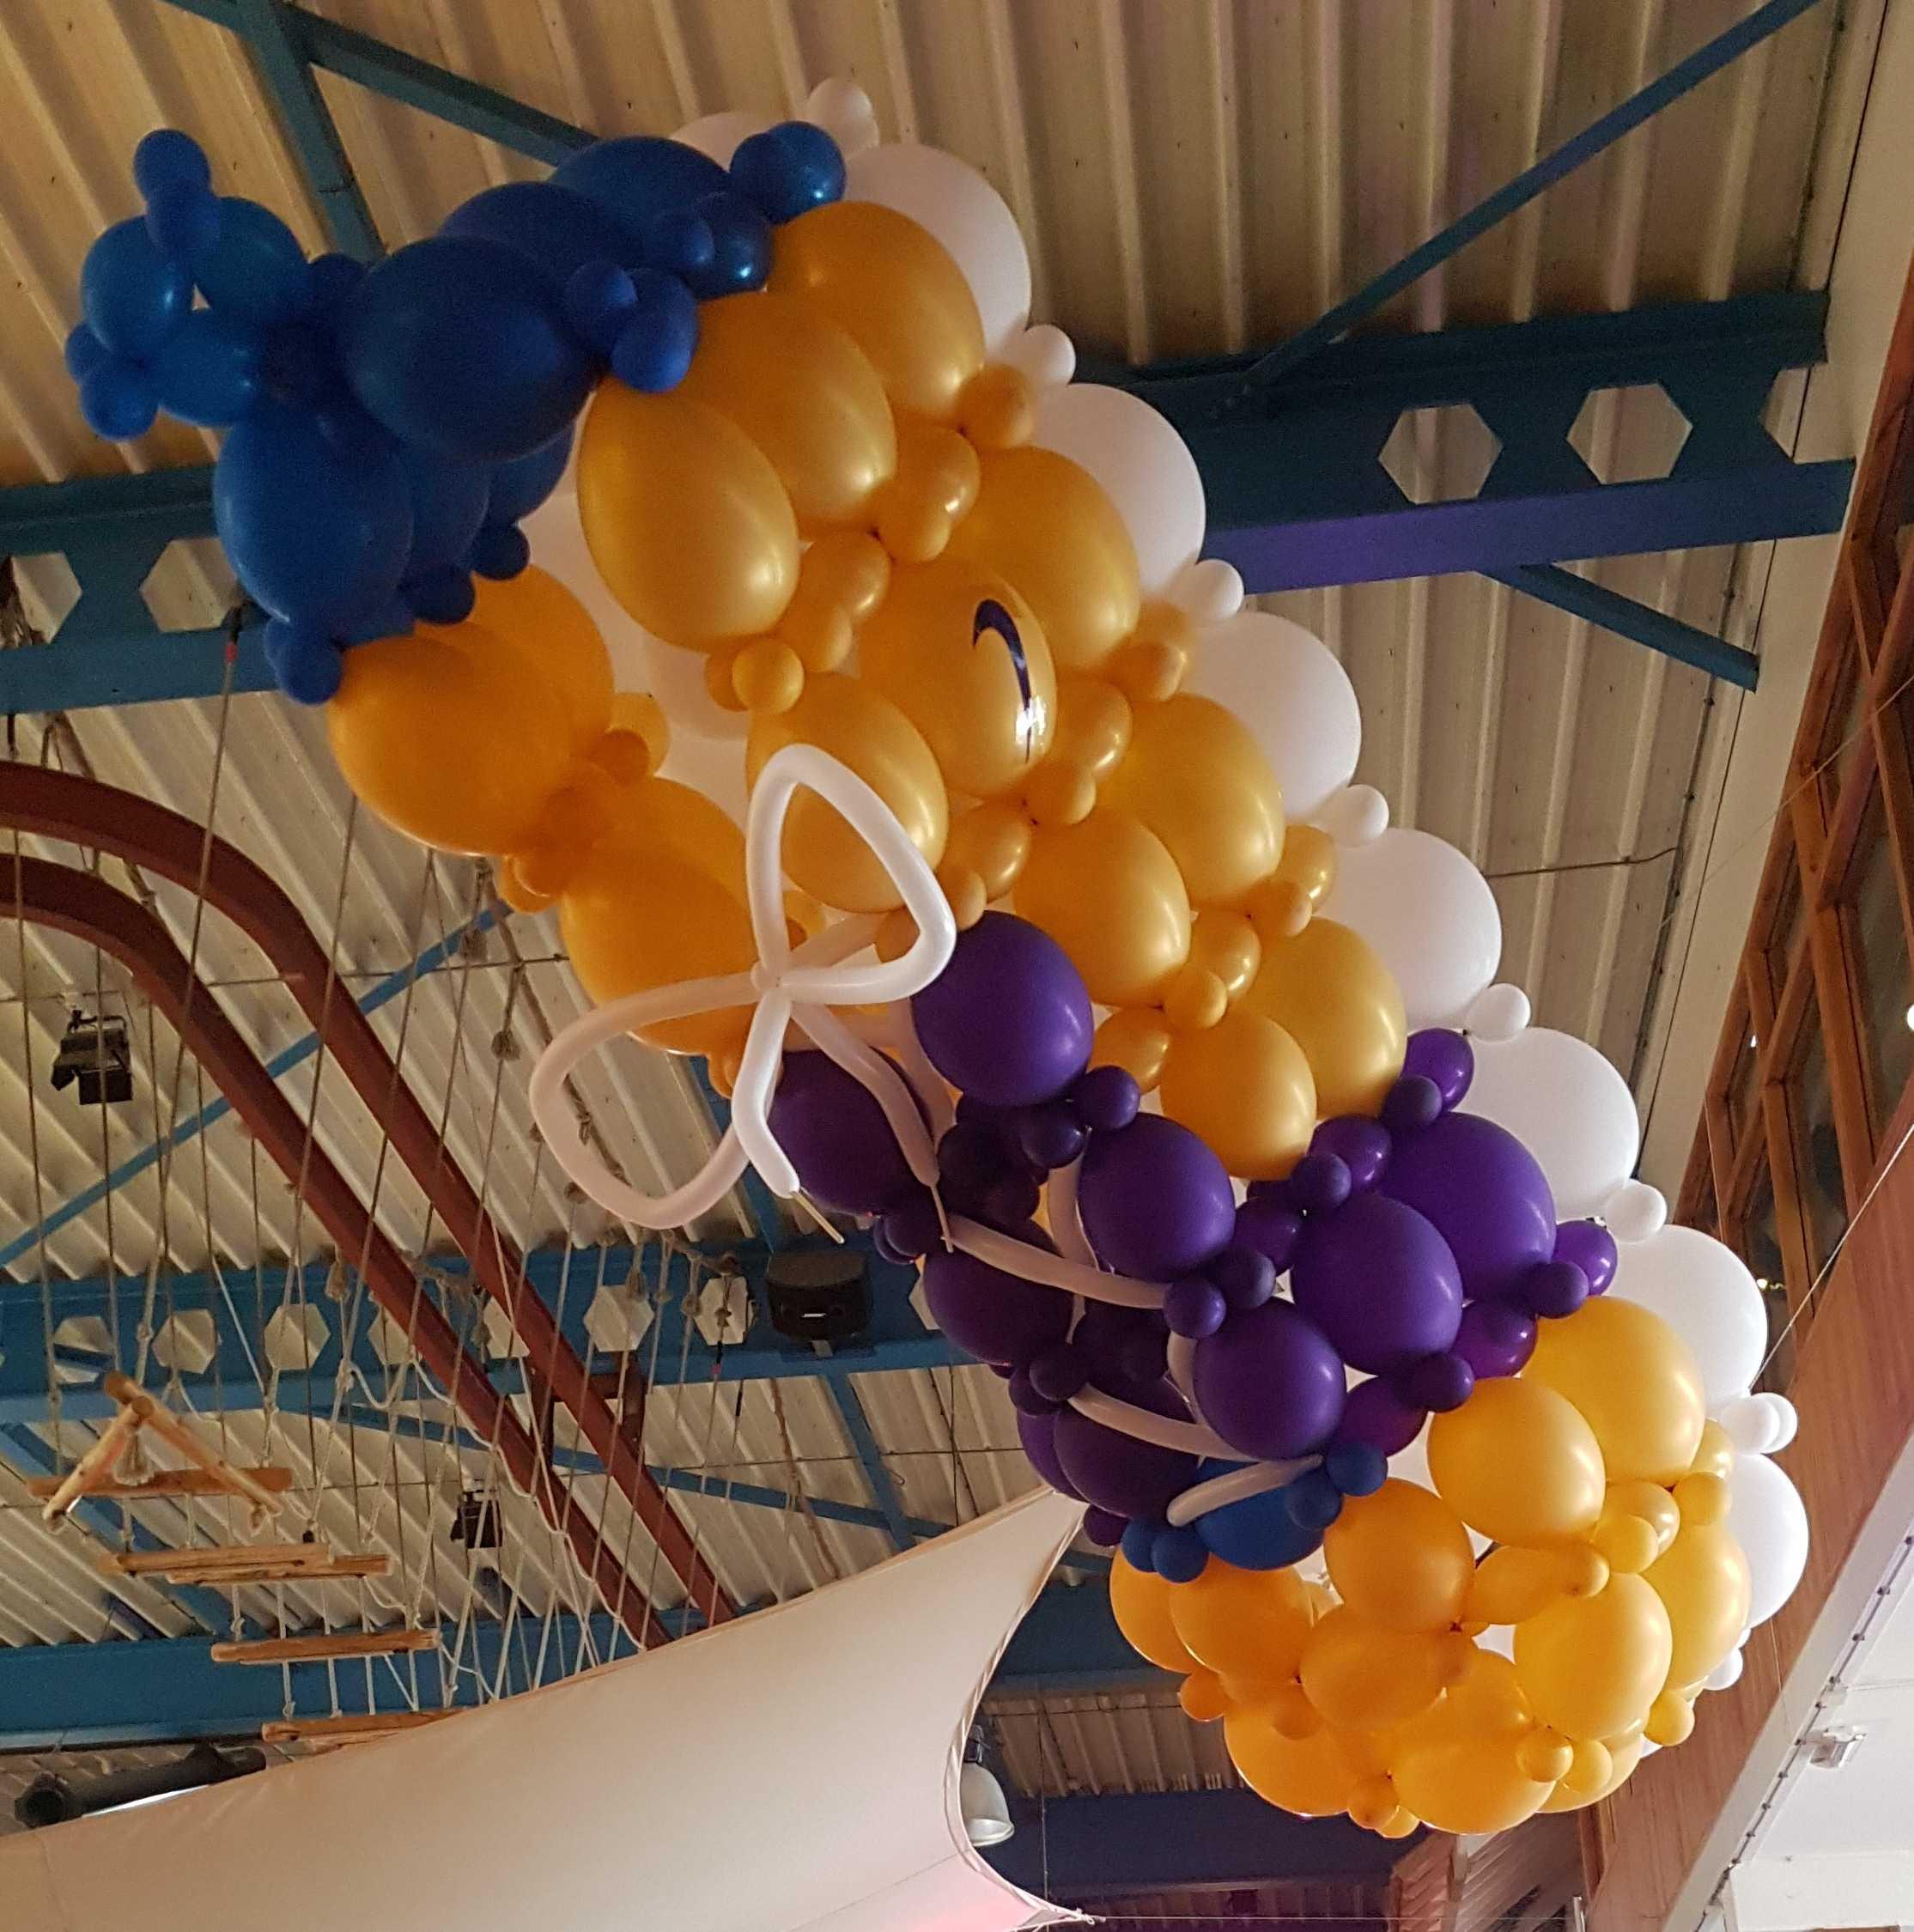 bruiloft-ballon-sneaker-in-de-lucht-hangend